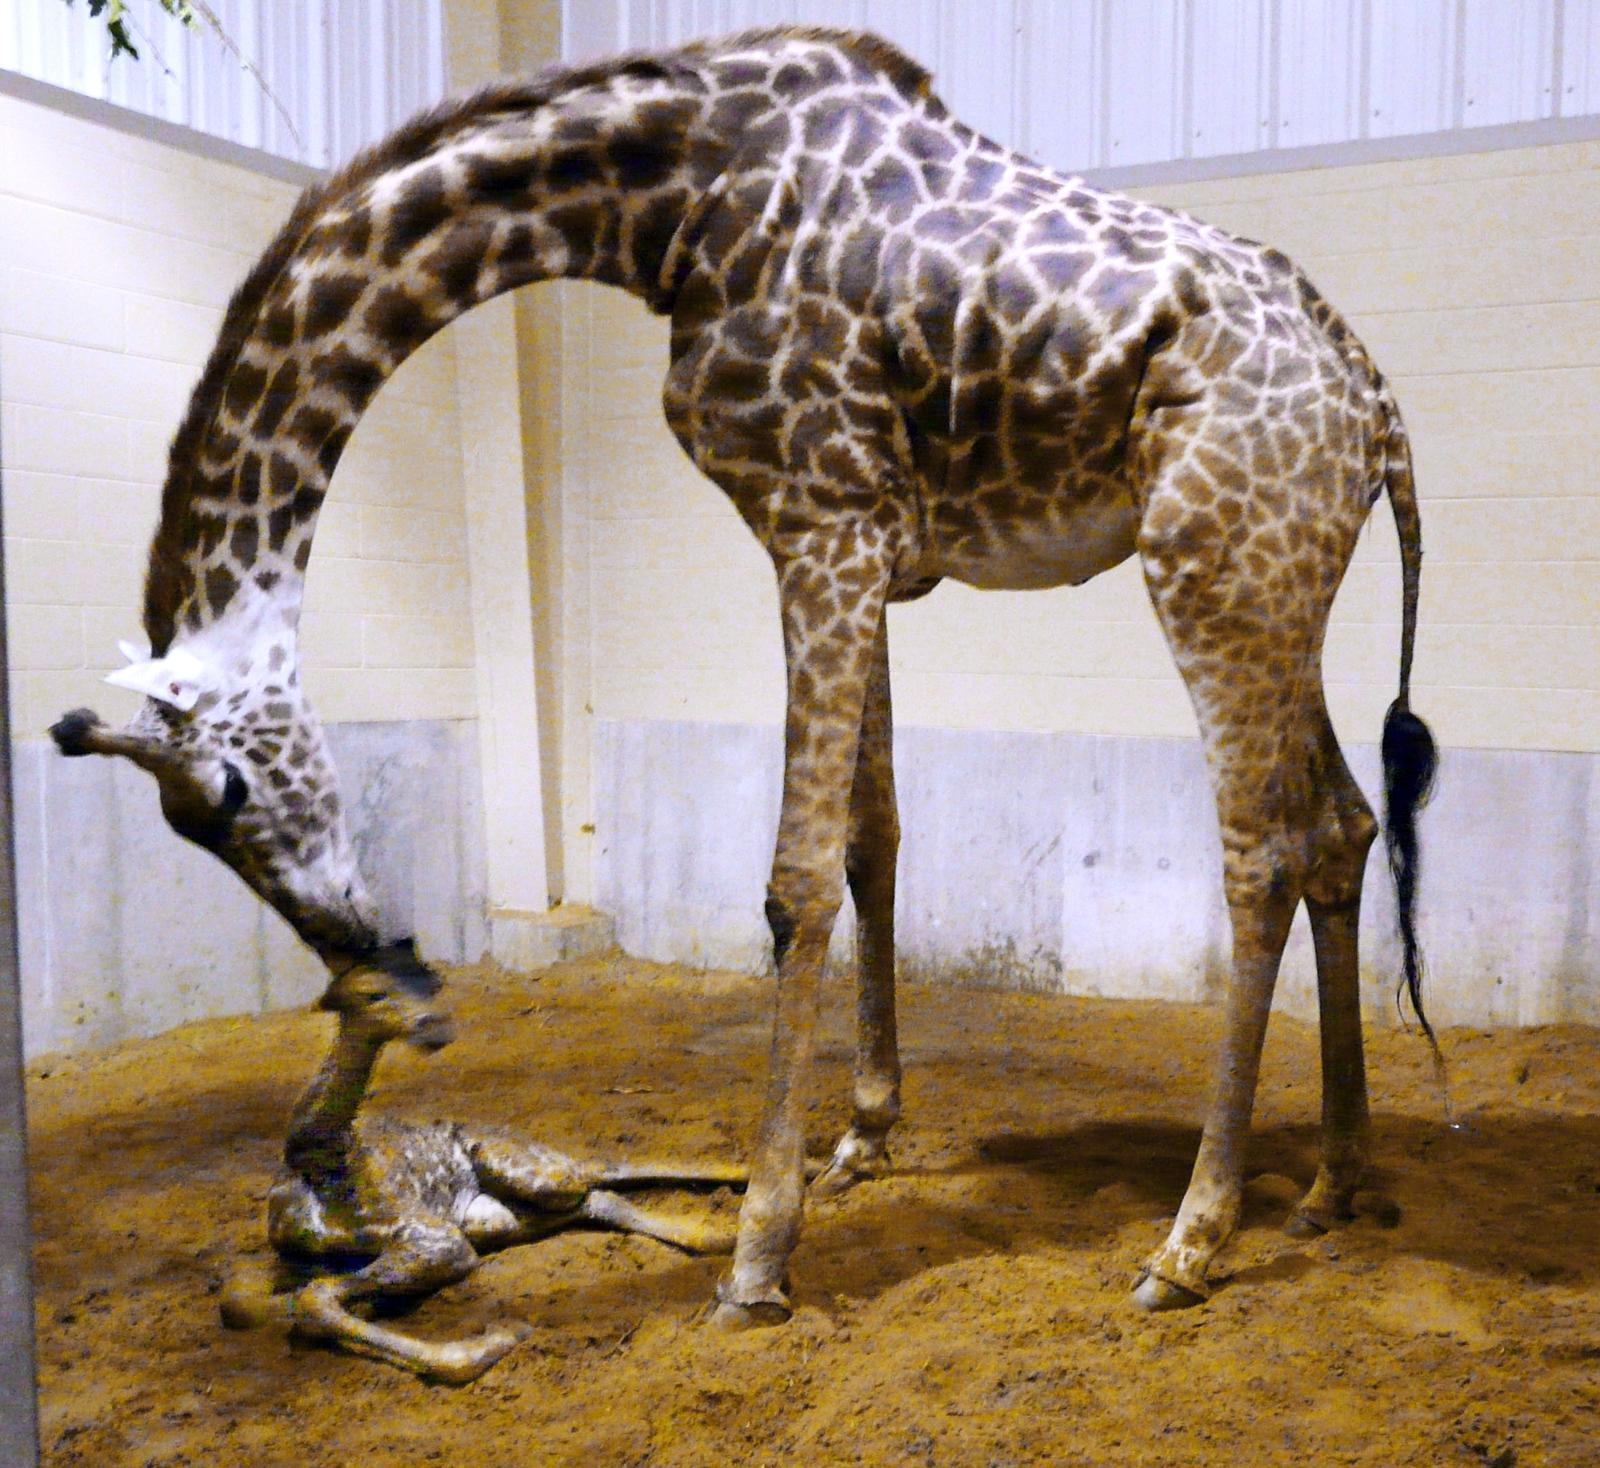 toledo zoo giraffe gives birth to lb baby girl the blade toledo zoo enlarge the